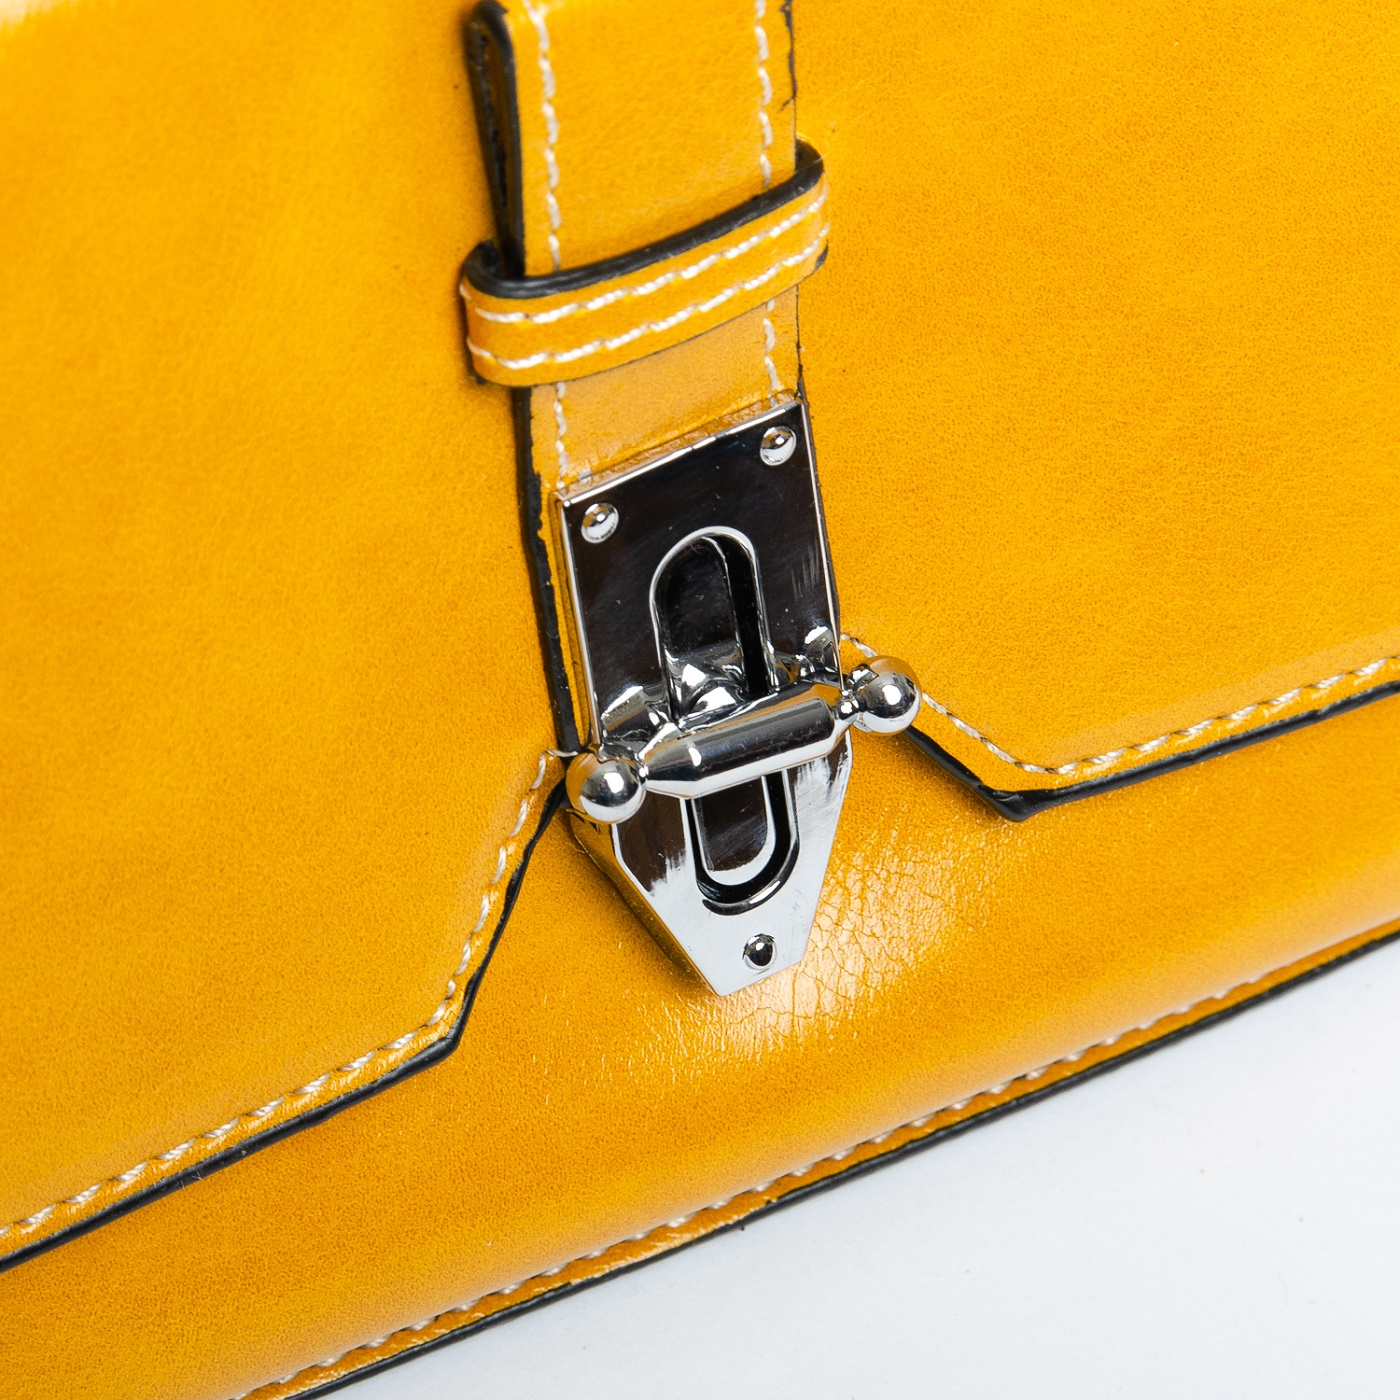 Сумка Женская Клатч иск-кожа FASHION 1-03 9983-1 yellow - фото 5